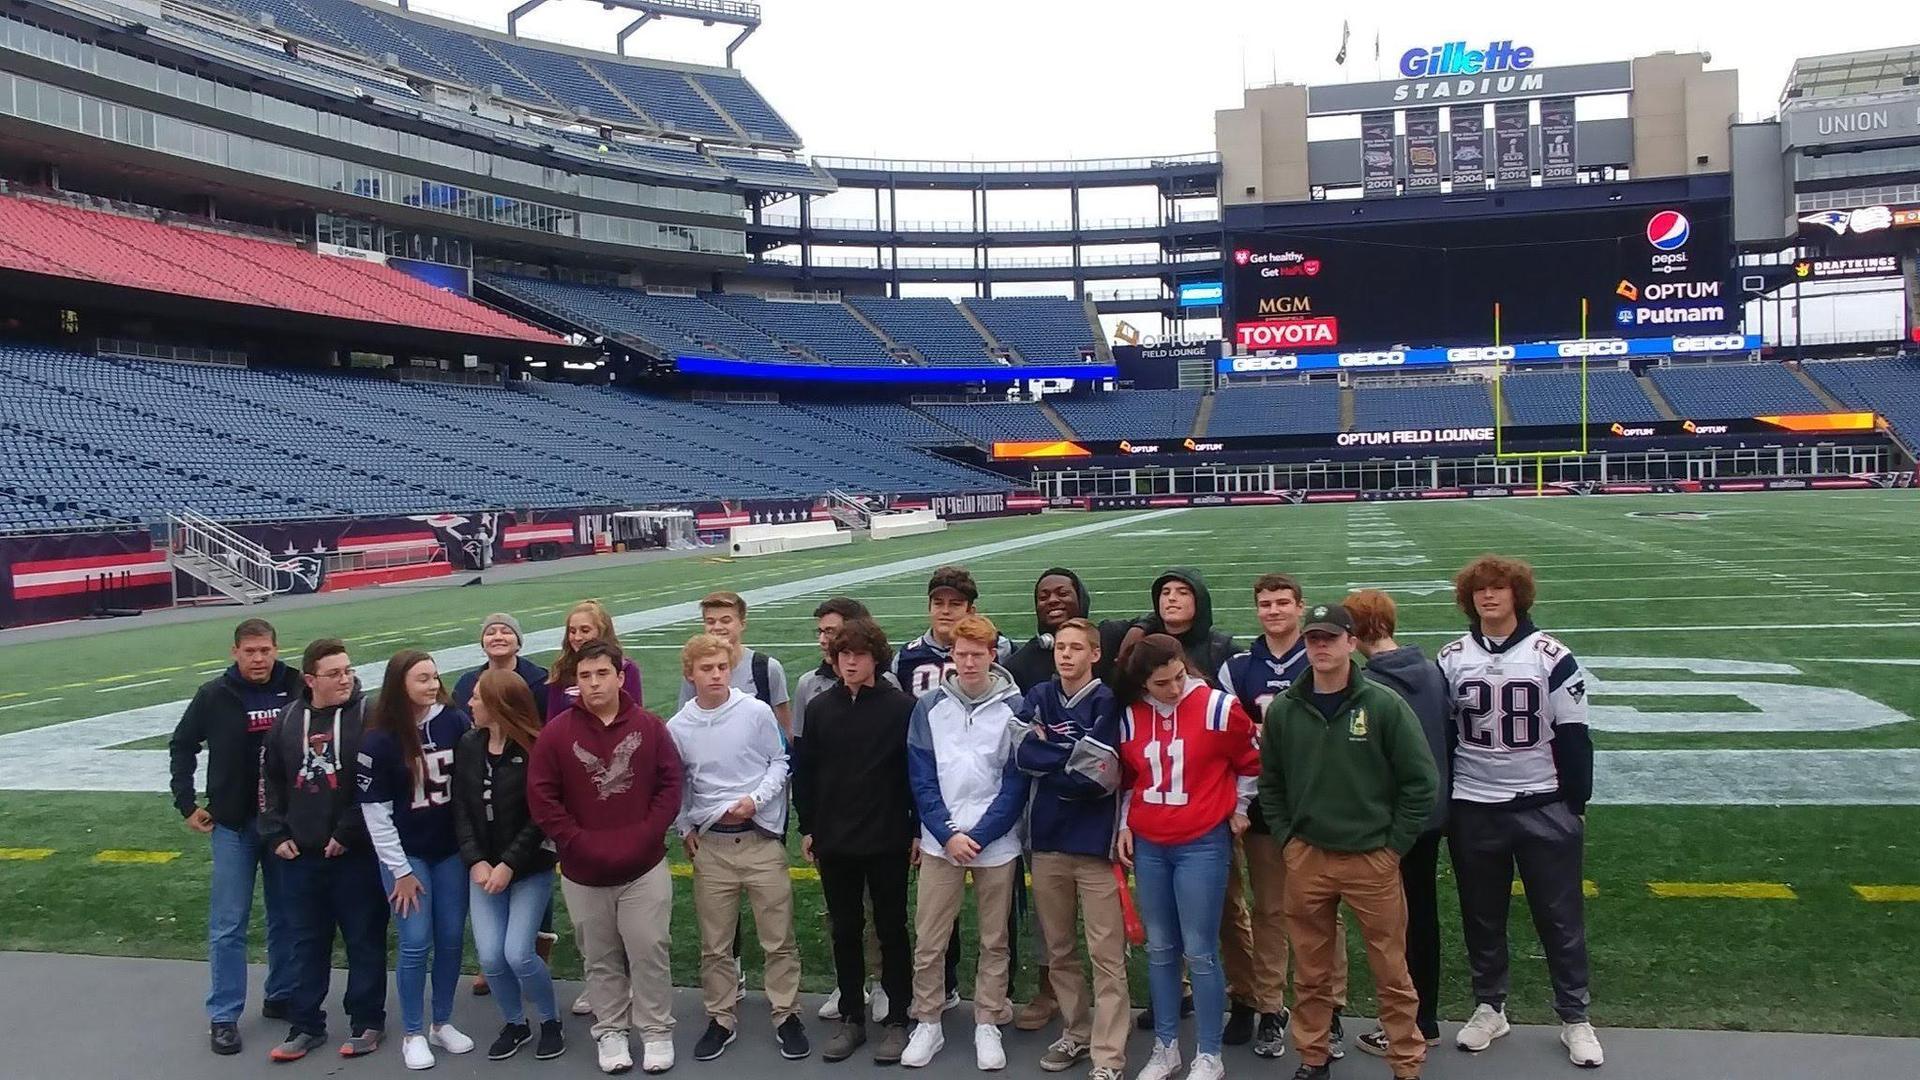 Marketing students visiting Gilette Stadium